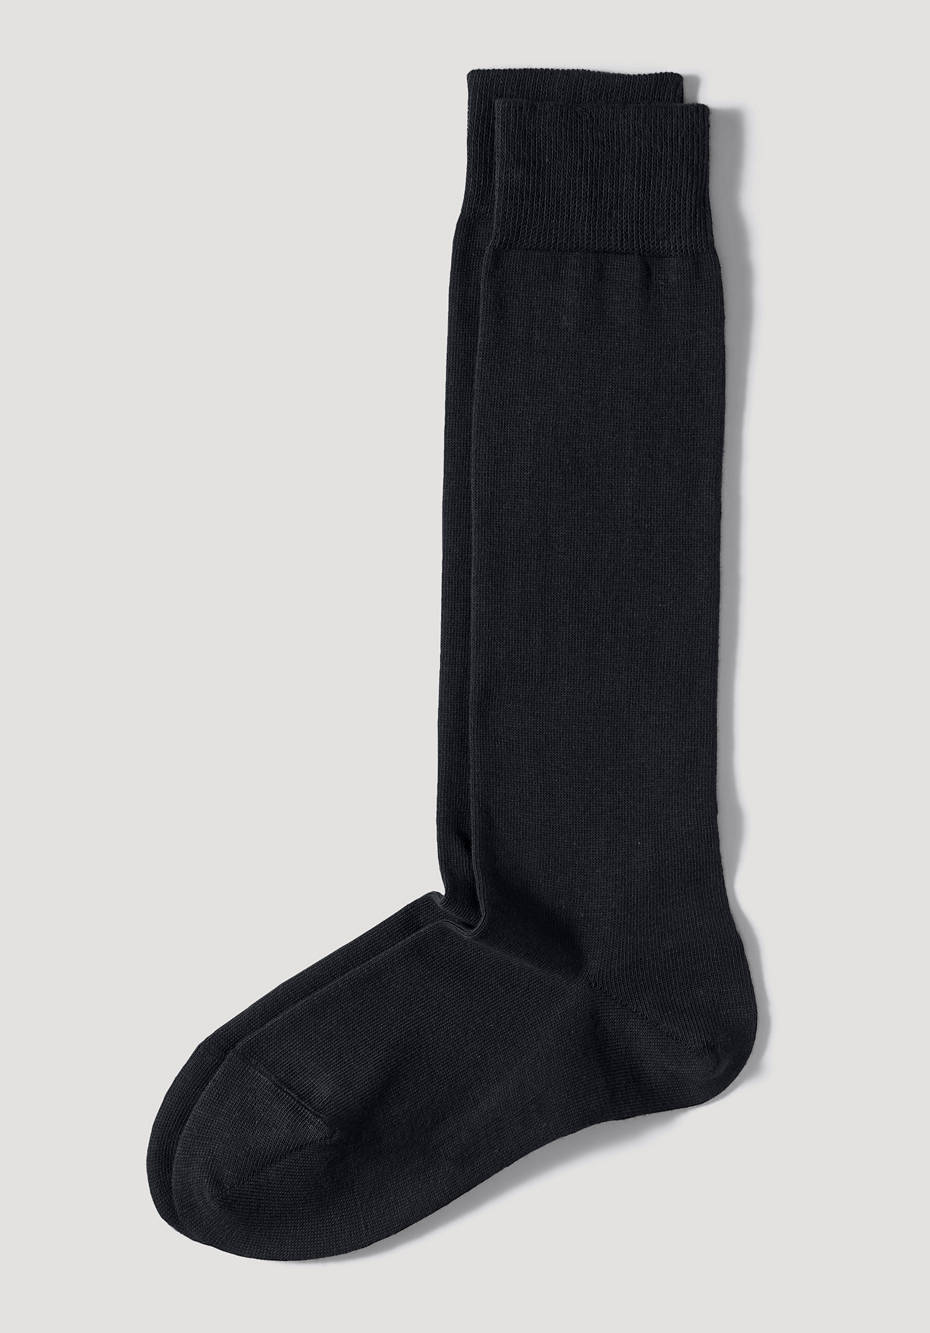 Organic cotton knee socks